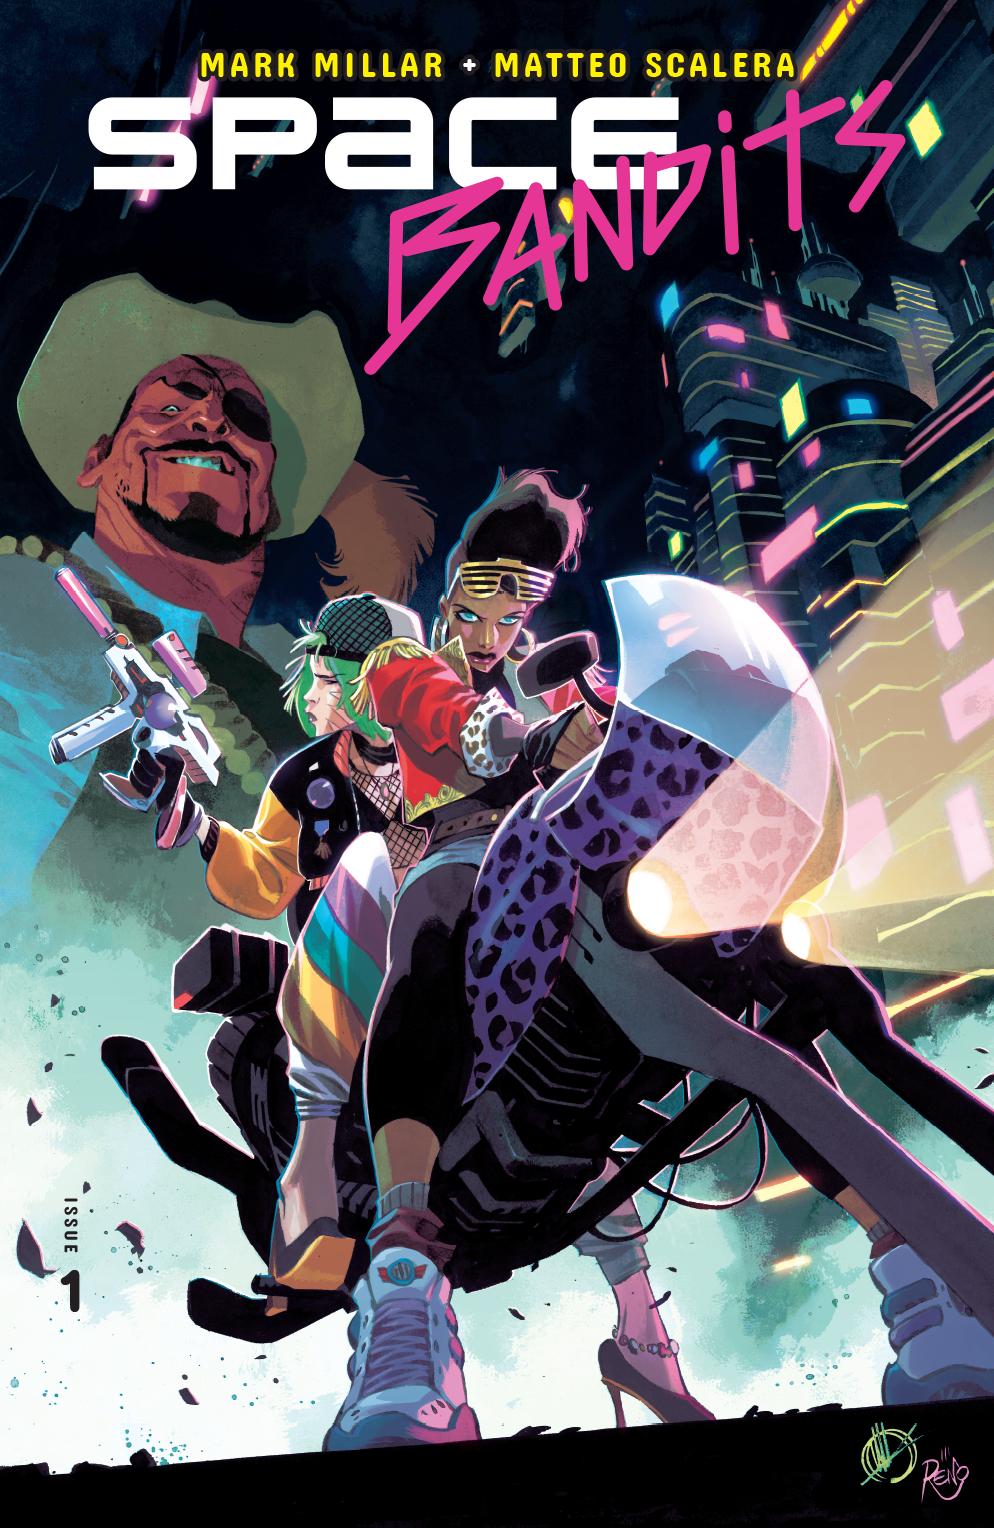 Space Bandits no. 1 (1 of 5) (2019 Series)